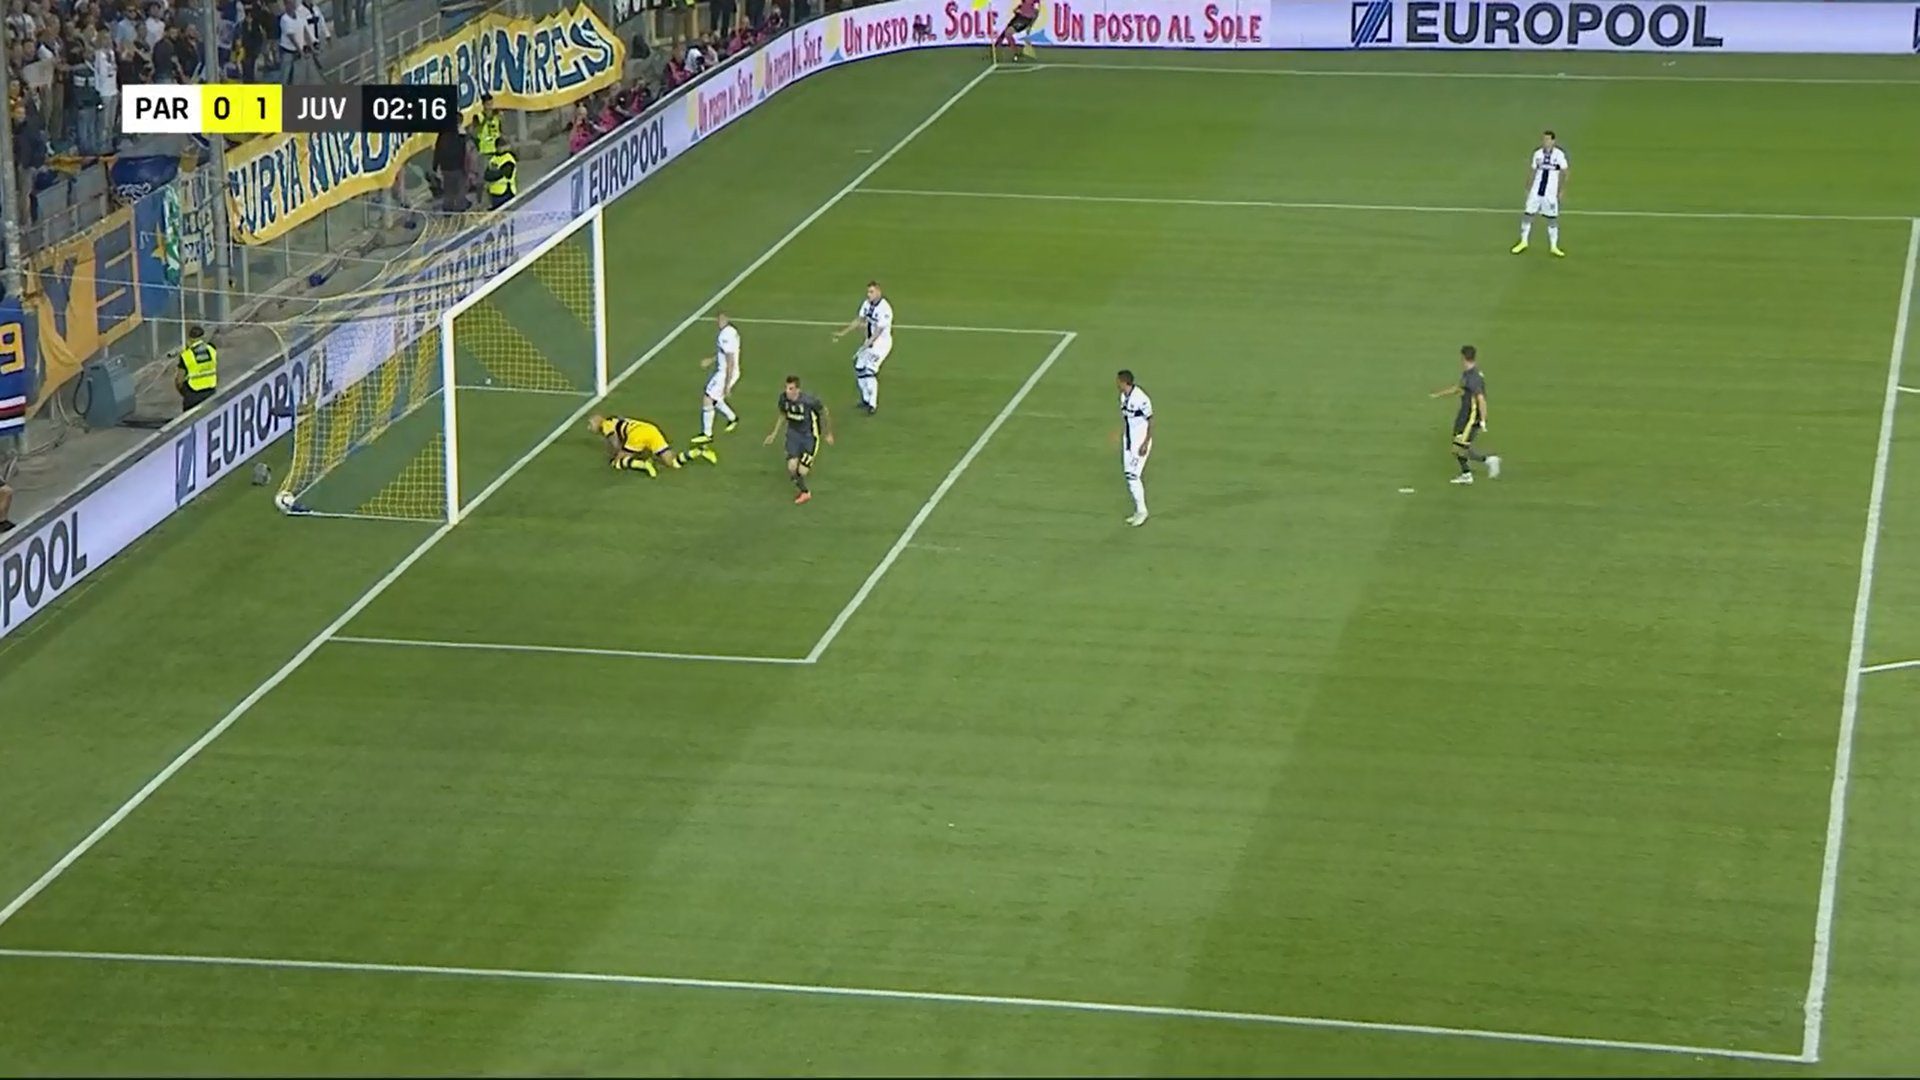 Secondo Nielsen Sport 723.525 spettatori medi per Parma - Juventus su DAZN